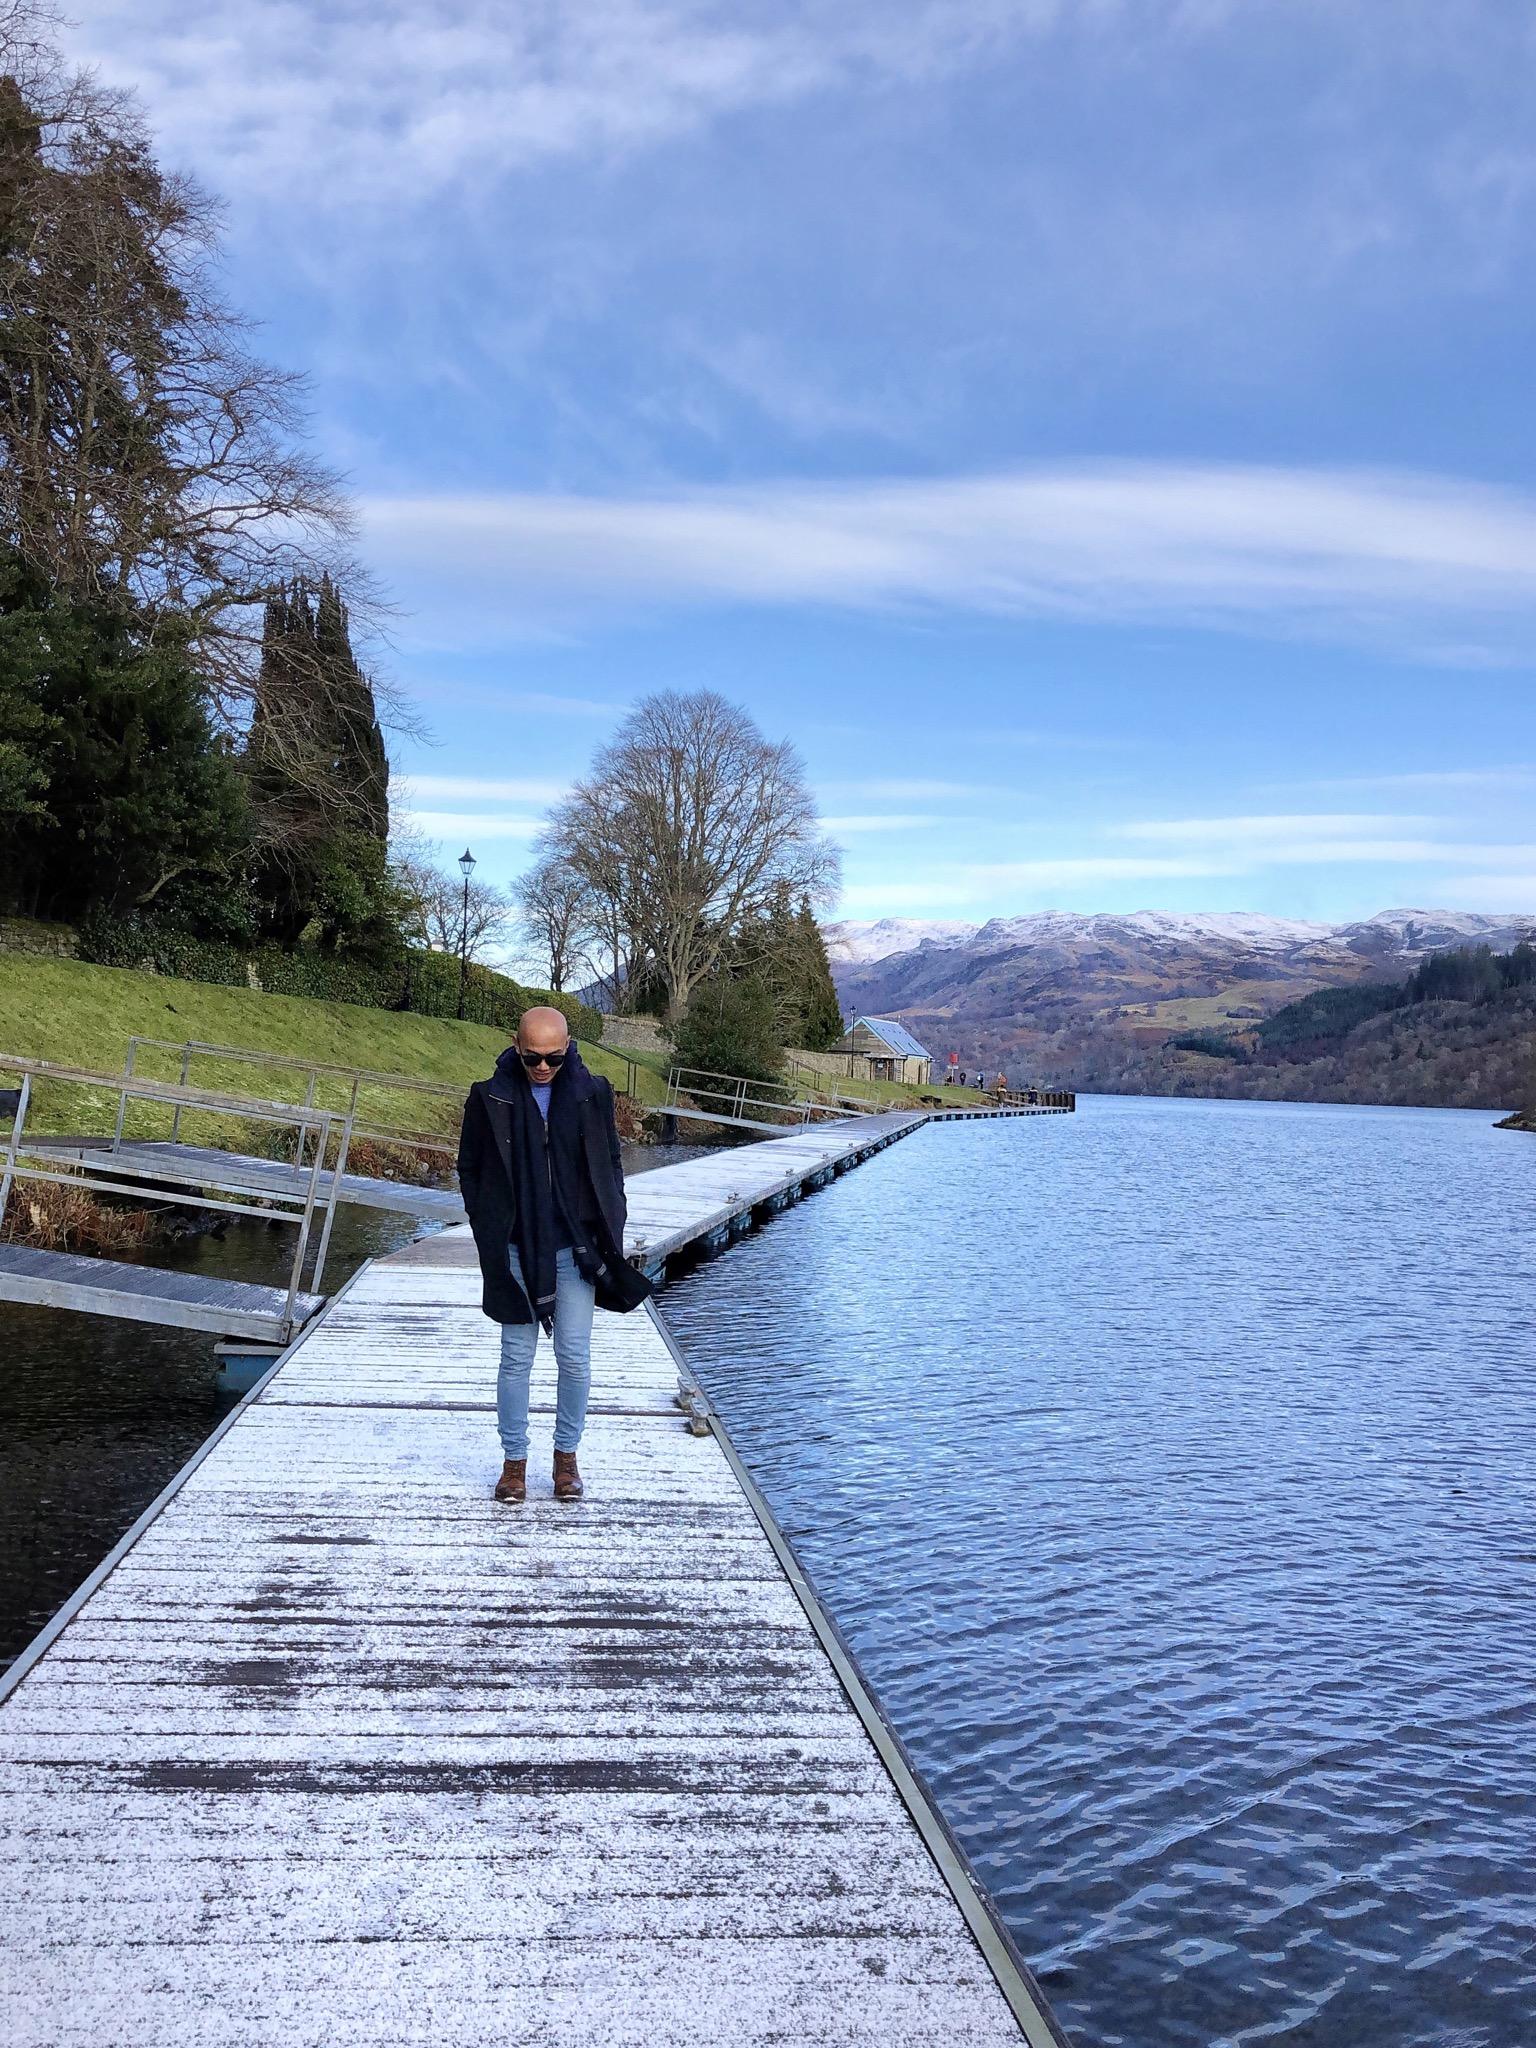 Loch Ness. IG:mchbrahm